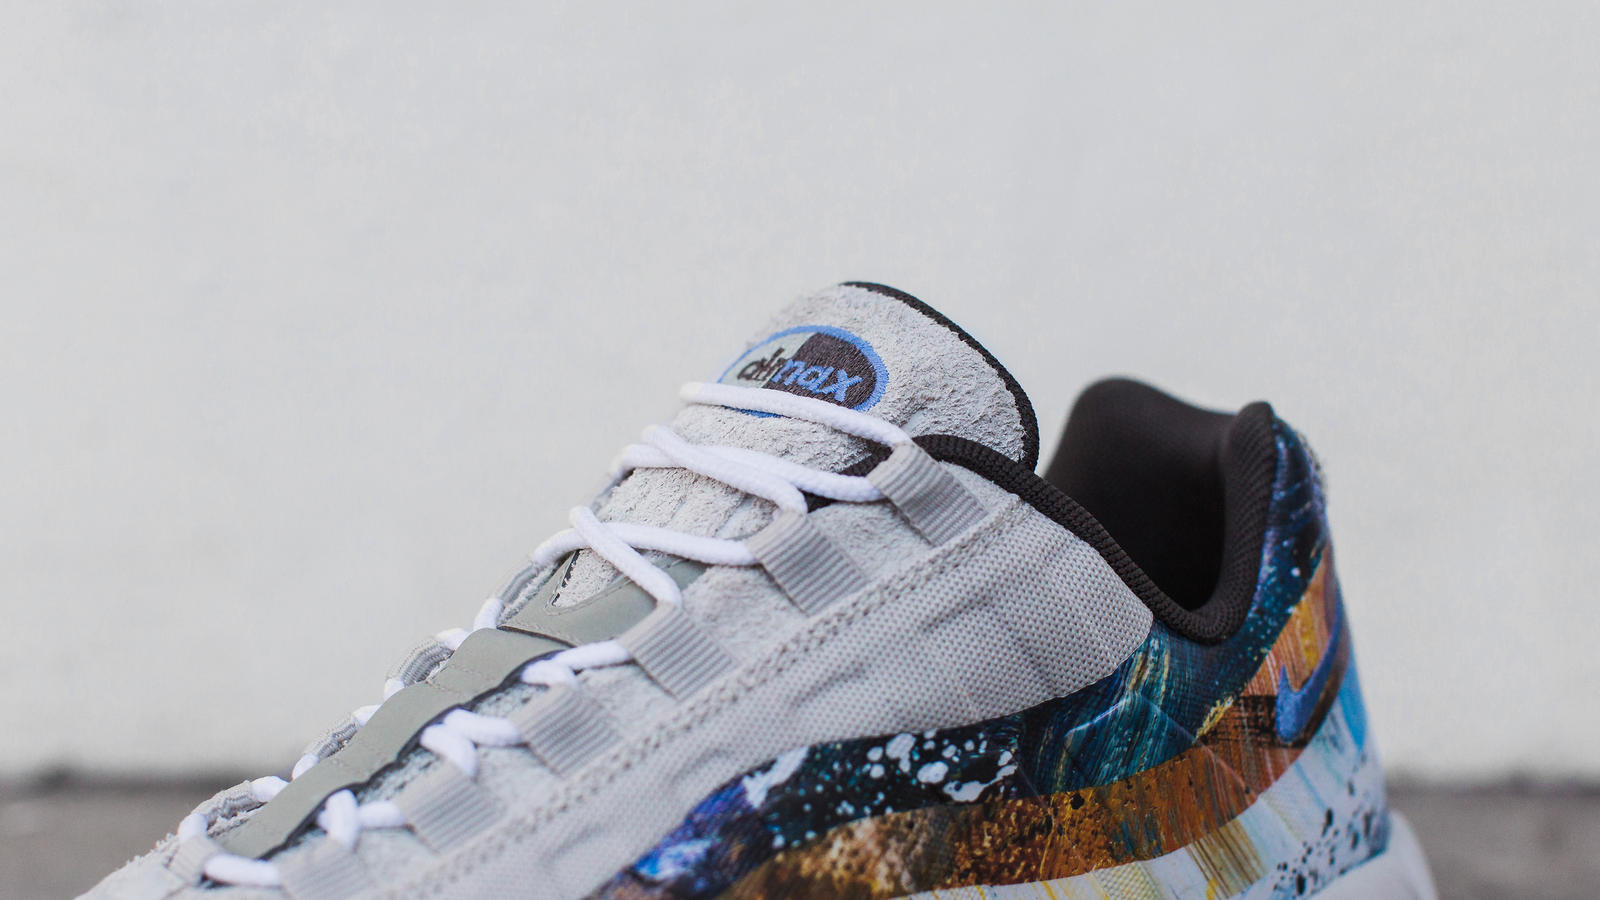 Nike Air Max 95 DW Dave White Pack - Soleracks 3c898e5ca75f